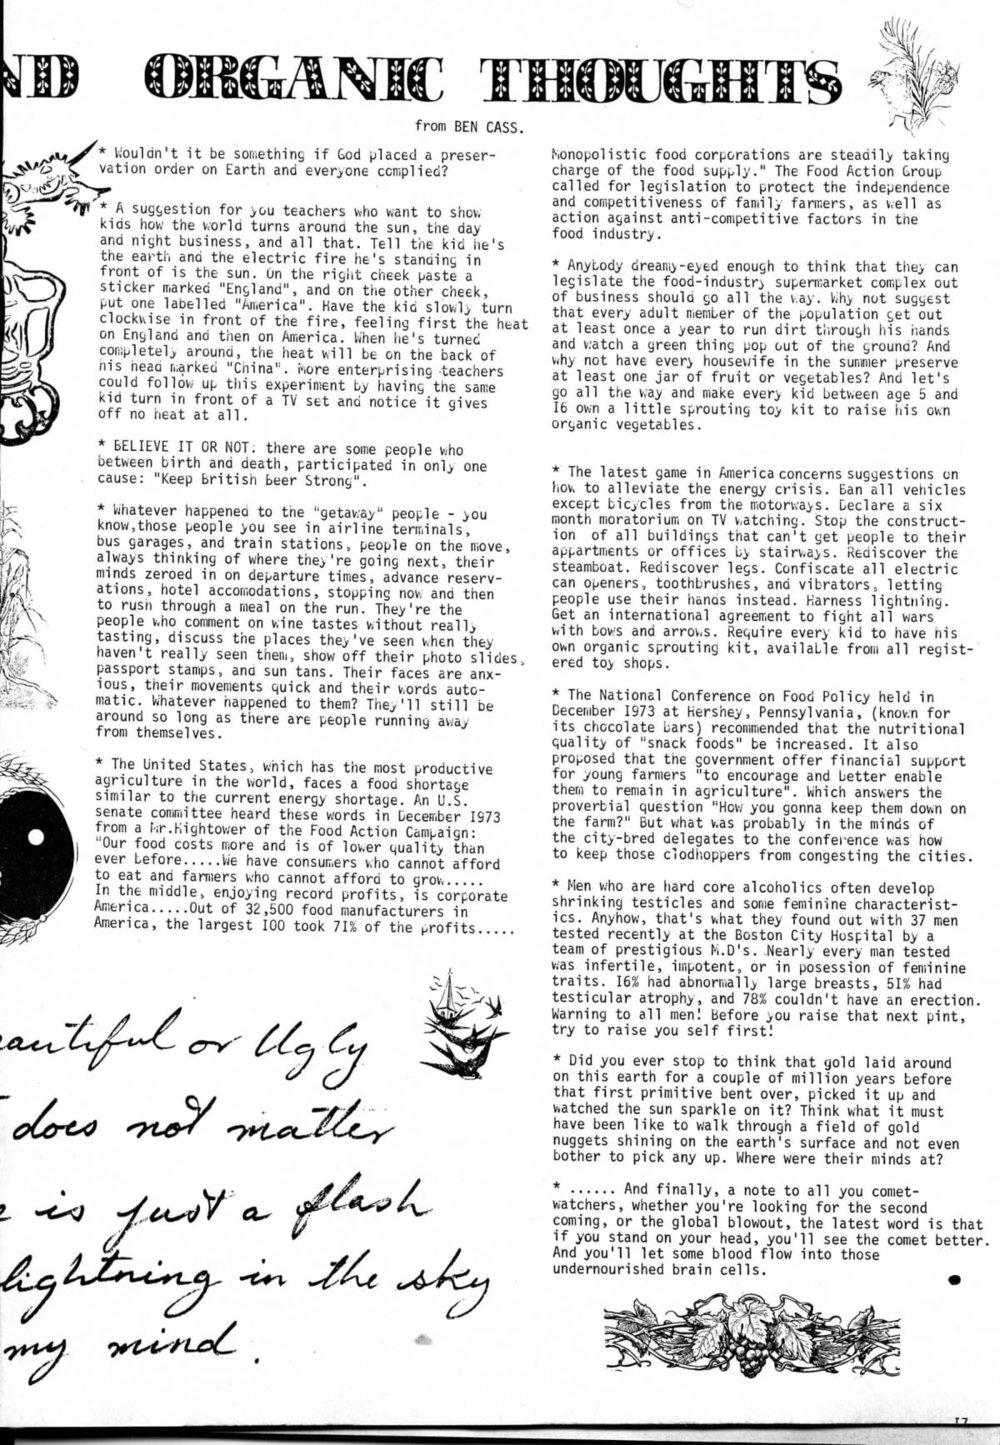 seed-v3-n1-jan1974-17.jpg